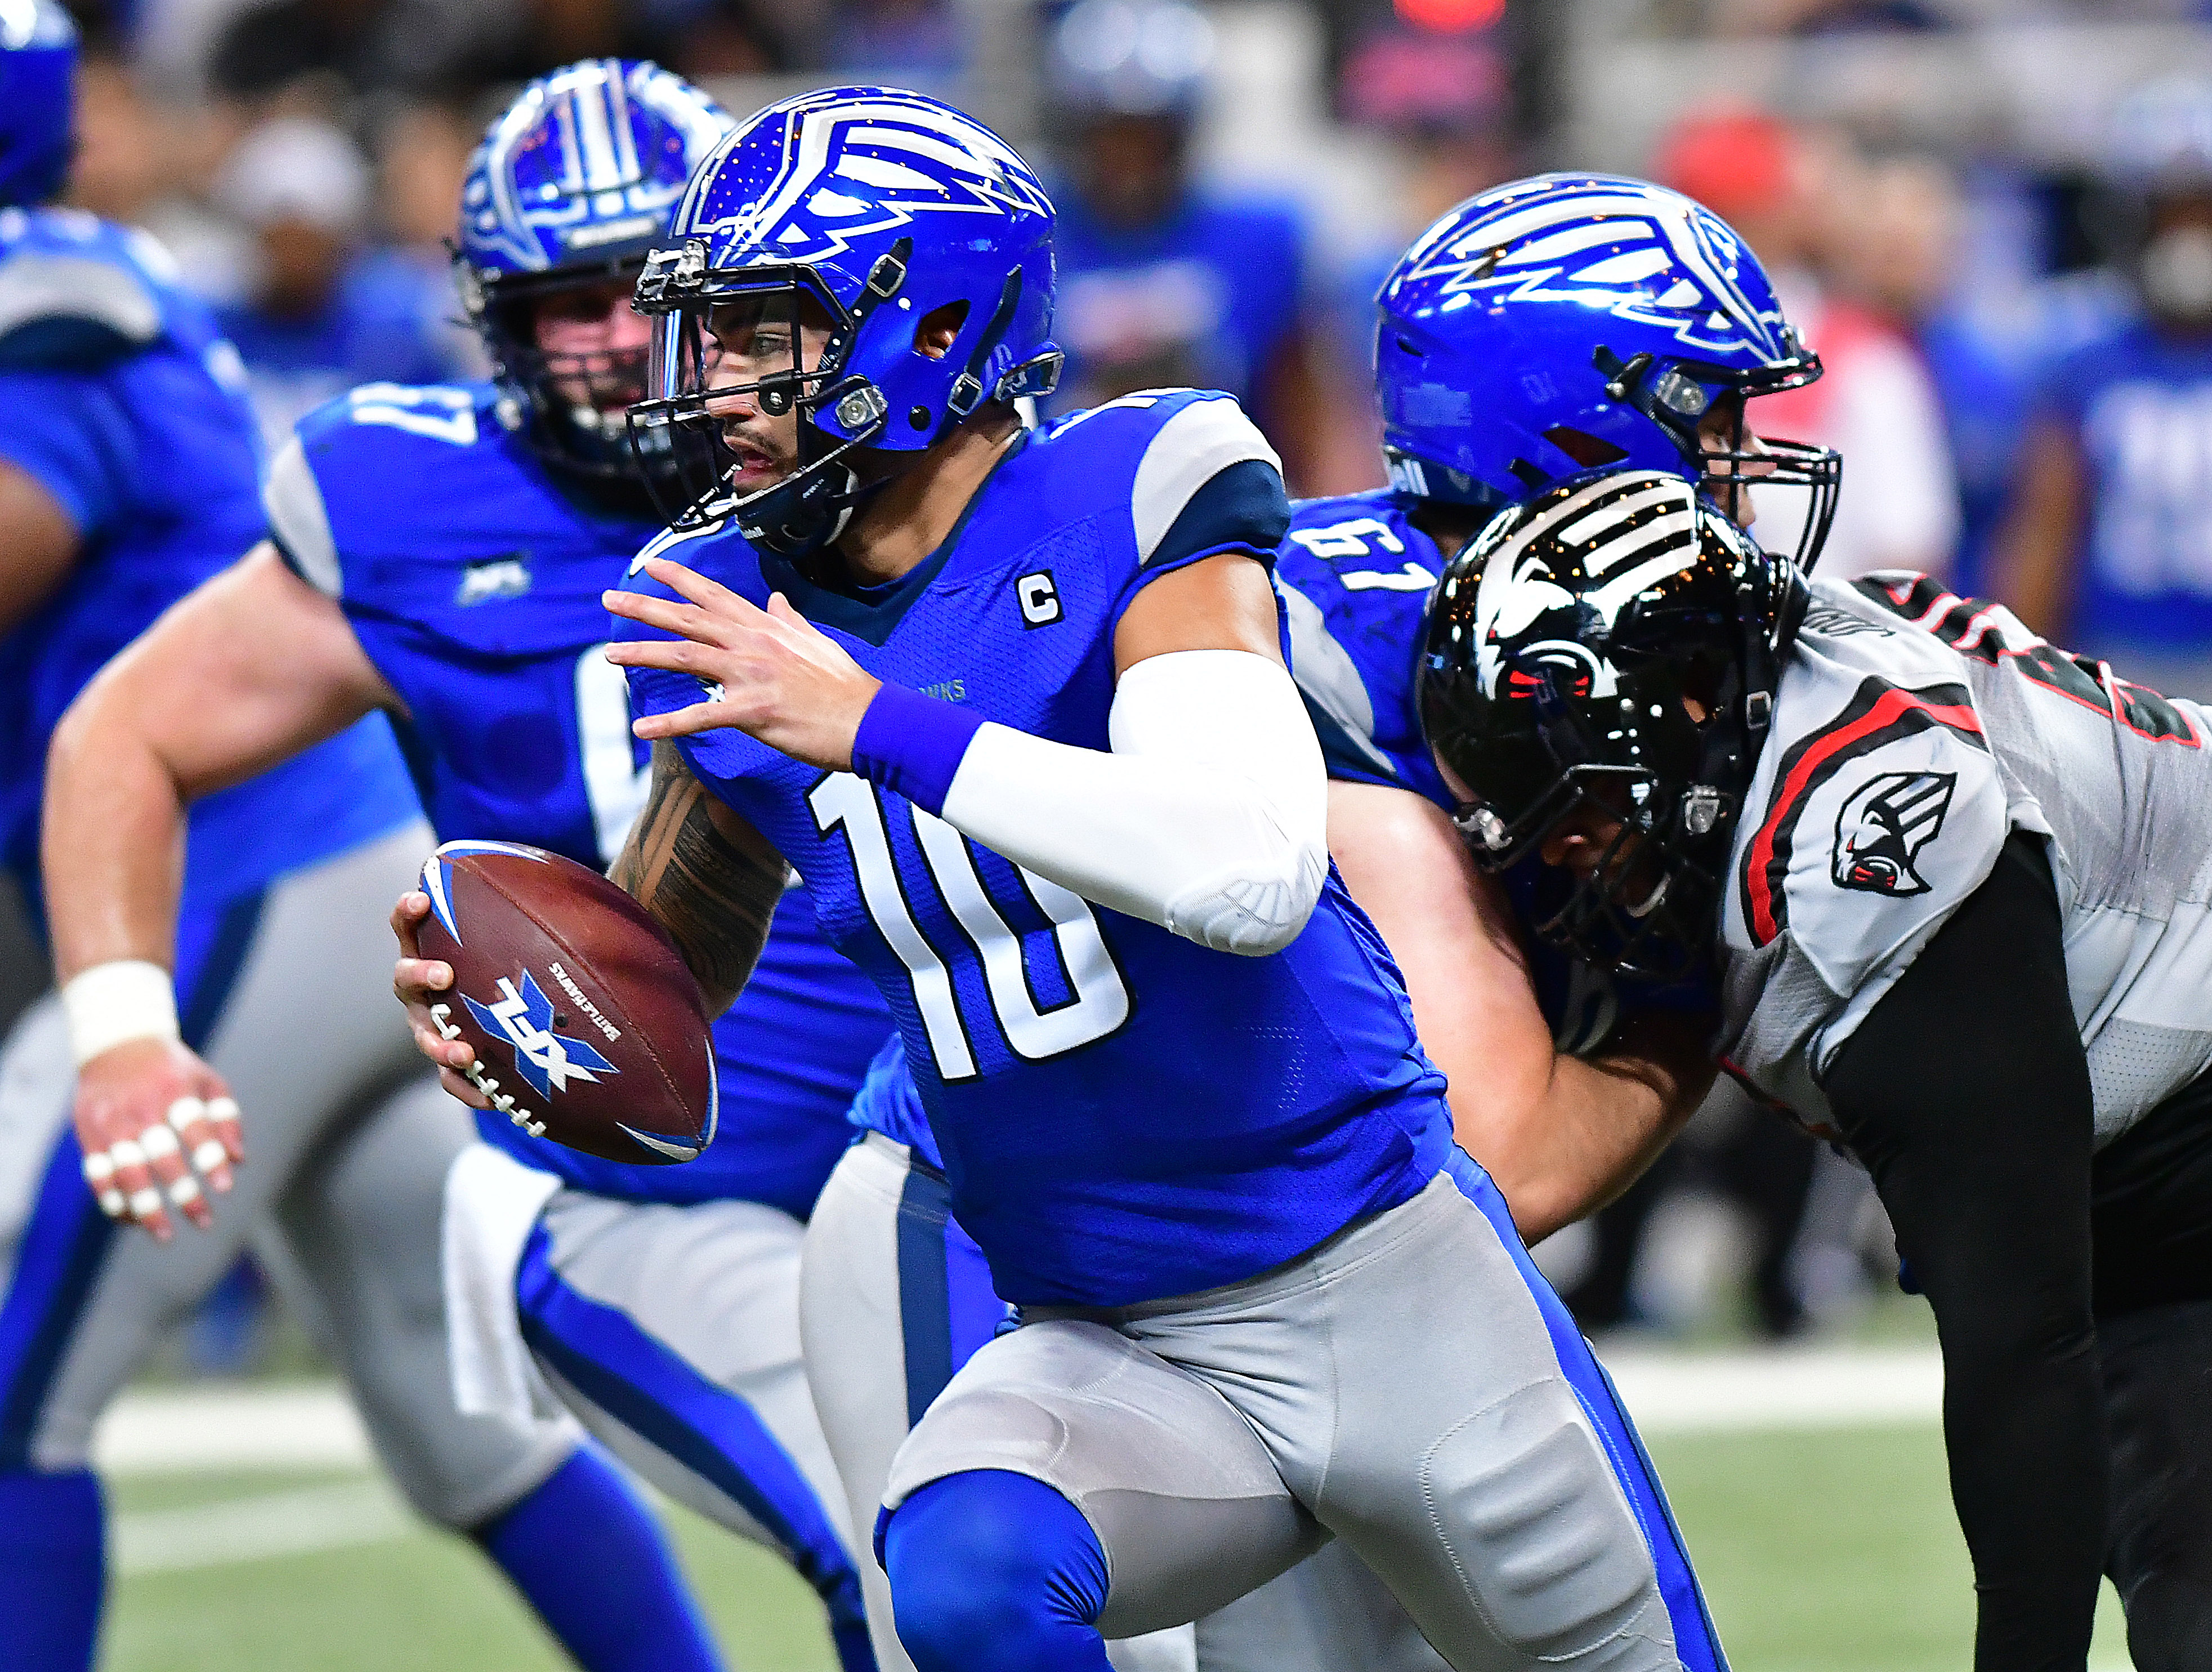 St. Louis BattleHawks quarterback Jordan Ta'amu running with the ball against the New York Guardians.